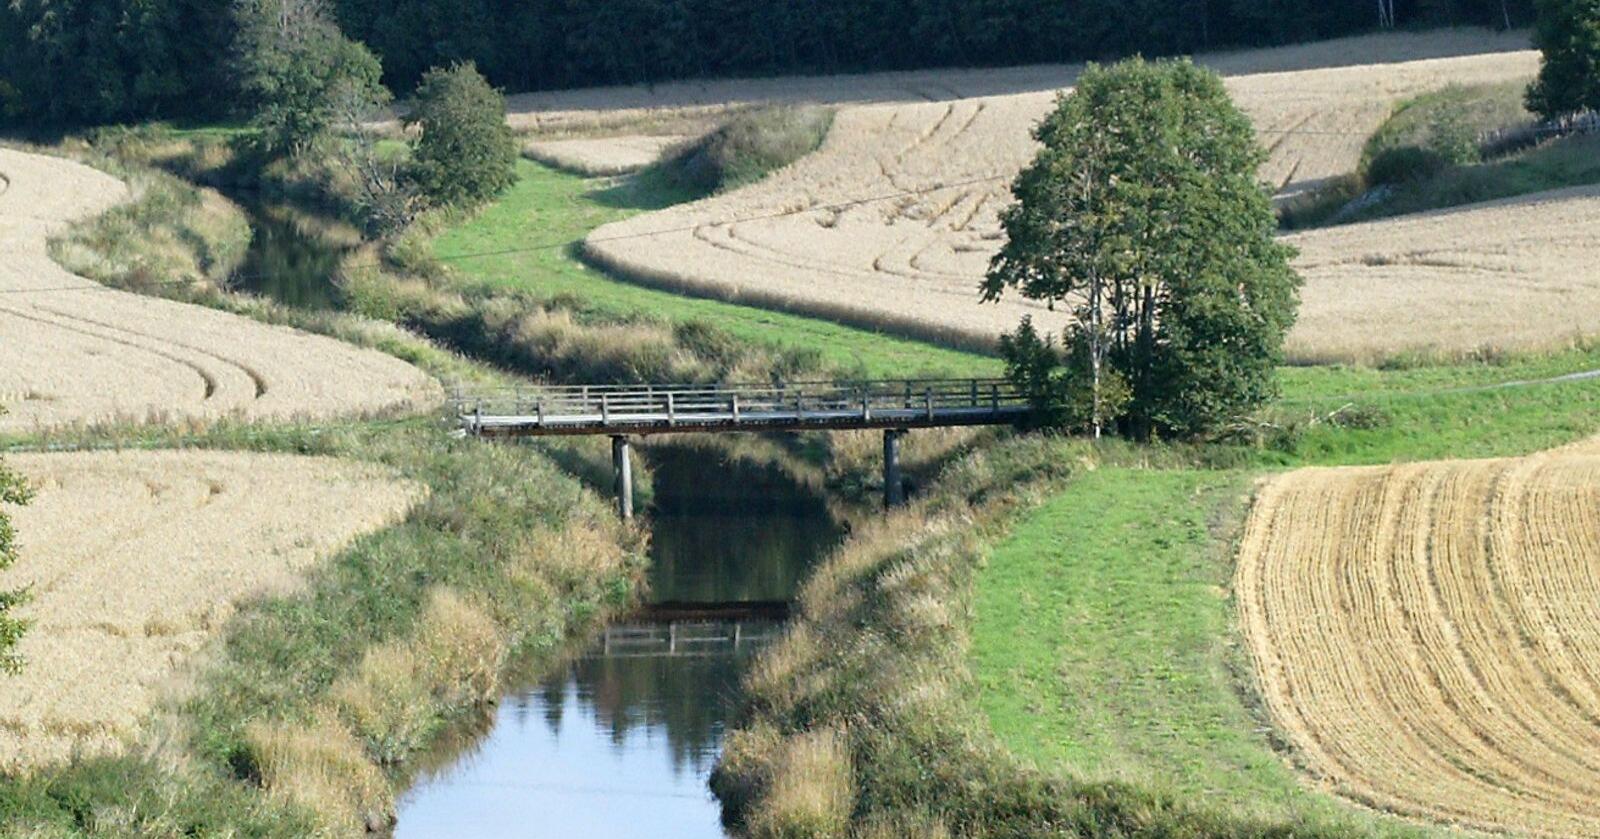 Negativt: 25 års undersøkelser av jordbruksbekker har vist at jordarbeiding om høsten påvirker vannkvaliteten negativt. Arkivfoto: Norsk Landbruk